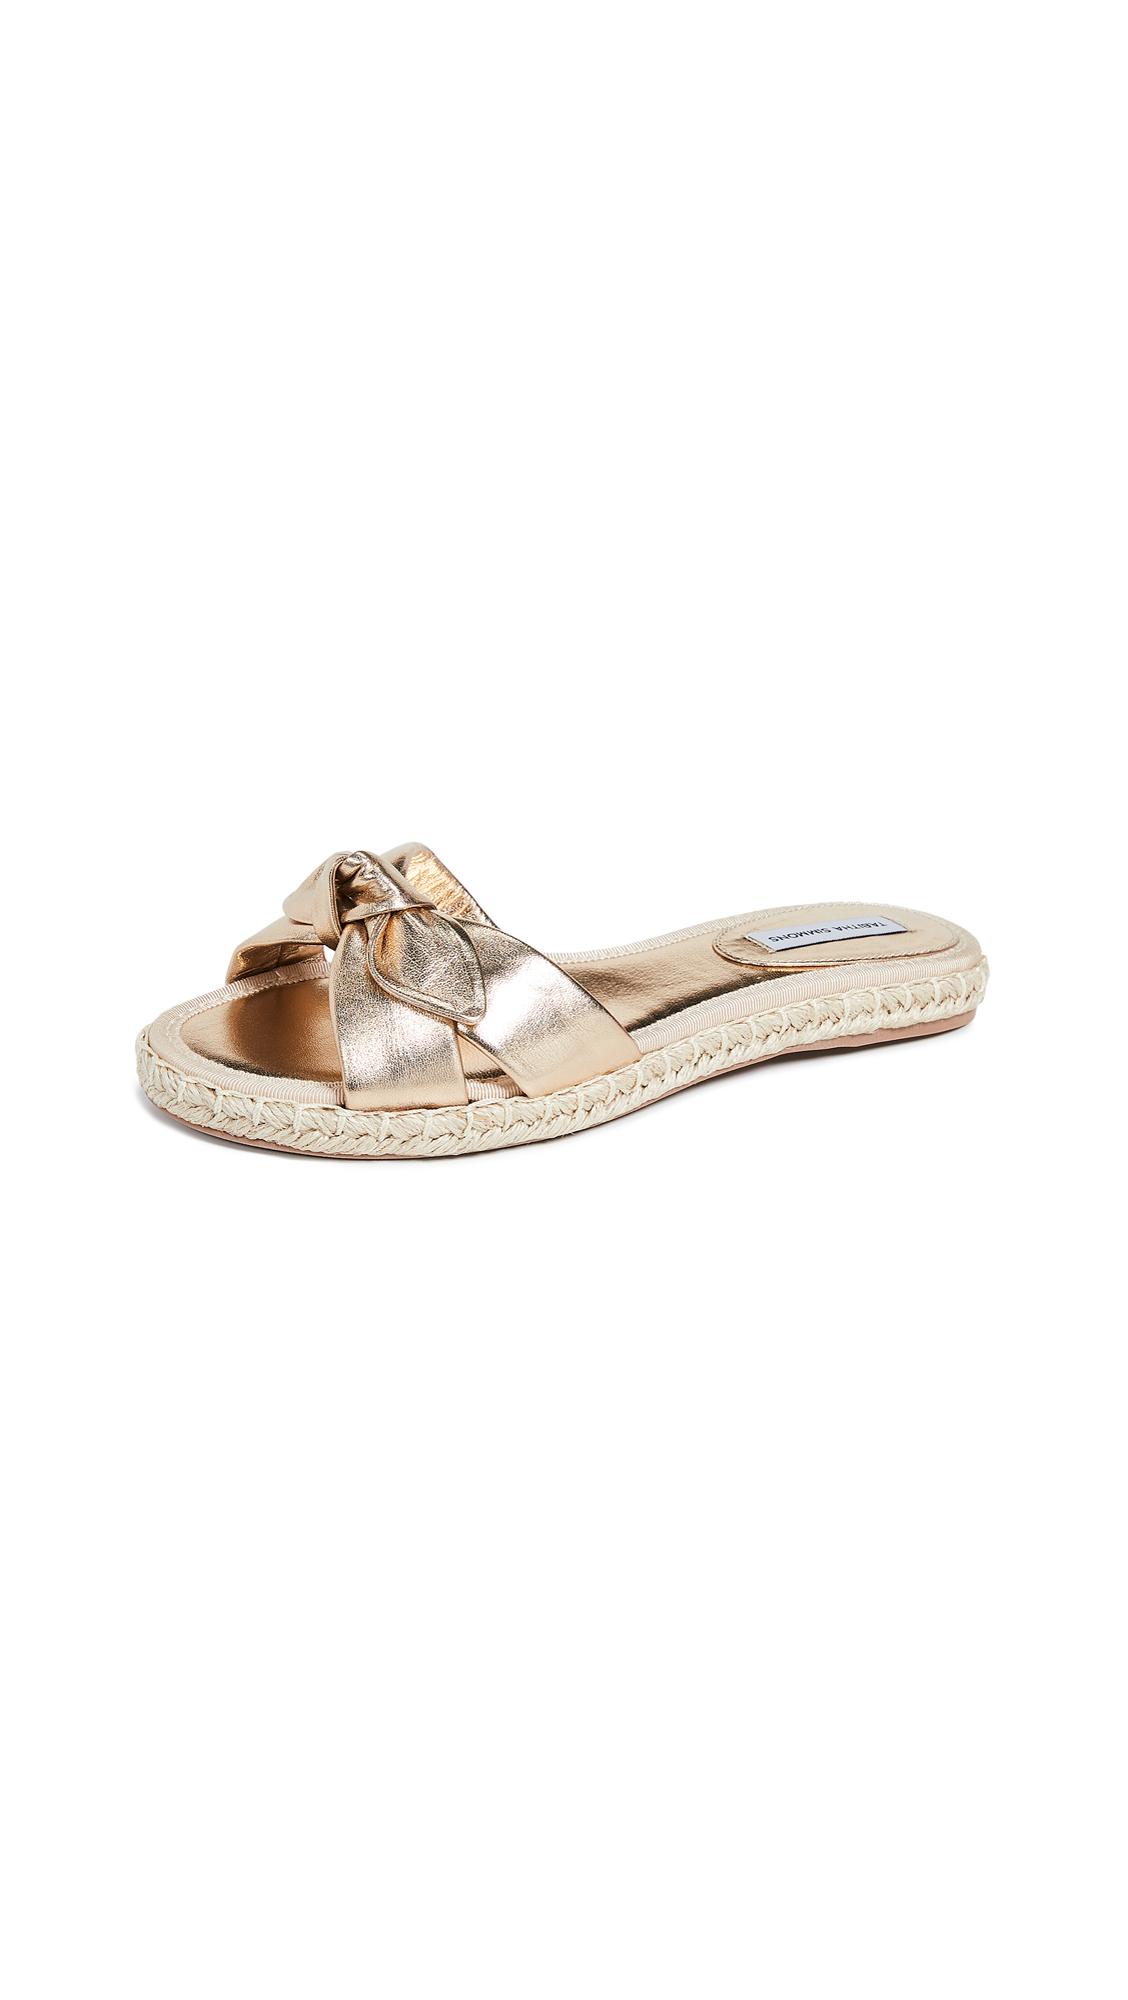 Buy Tabitha Simmons Heli Slides online, shop Tabitha Simmons